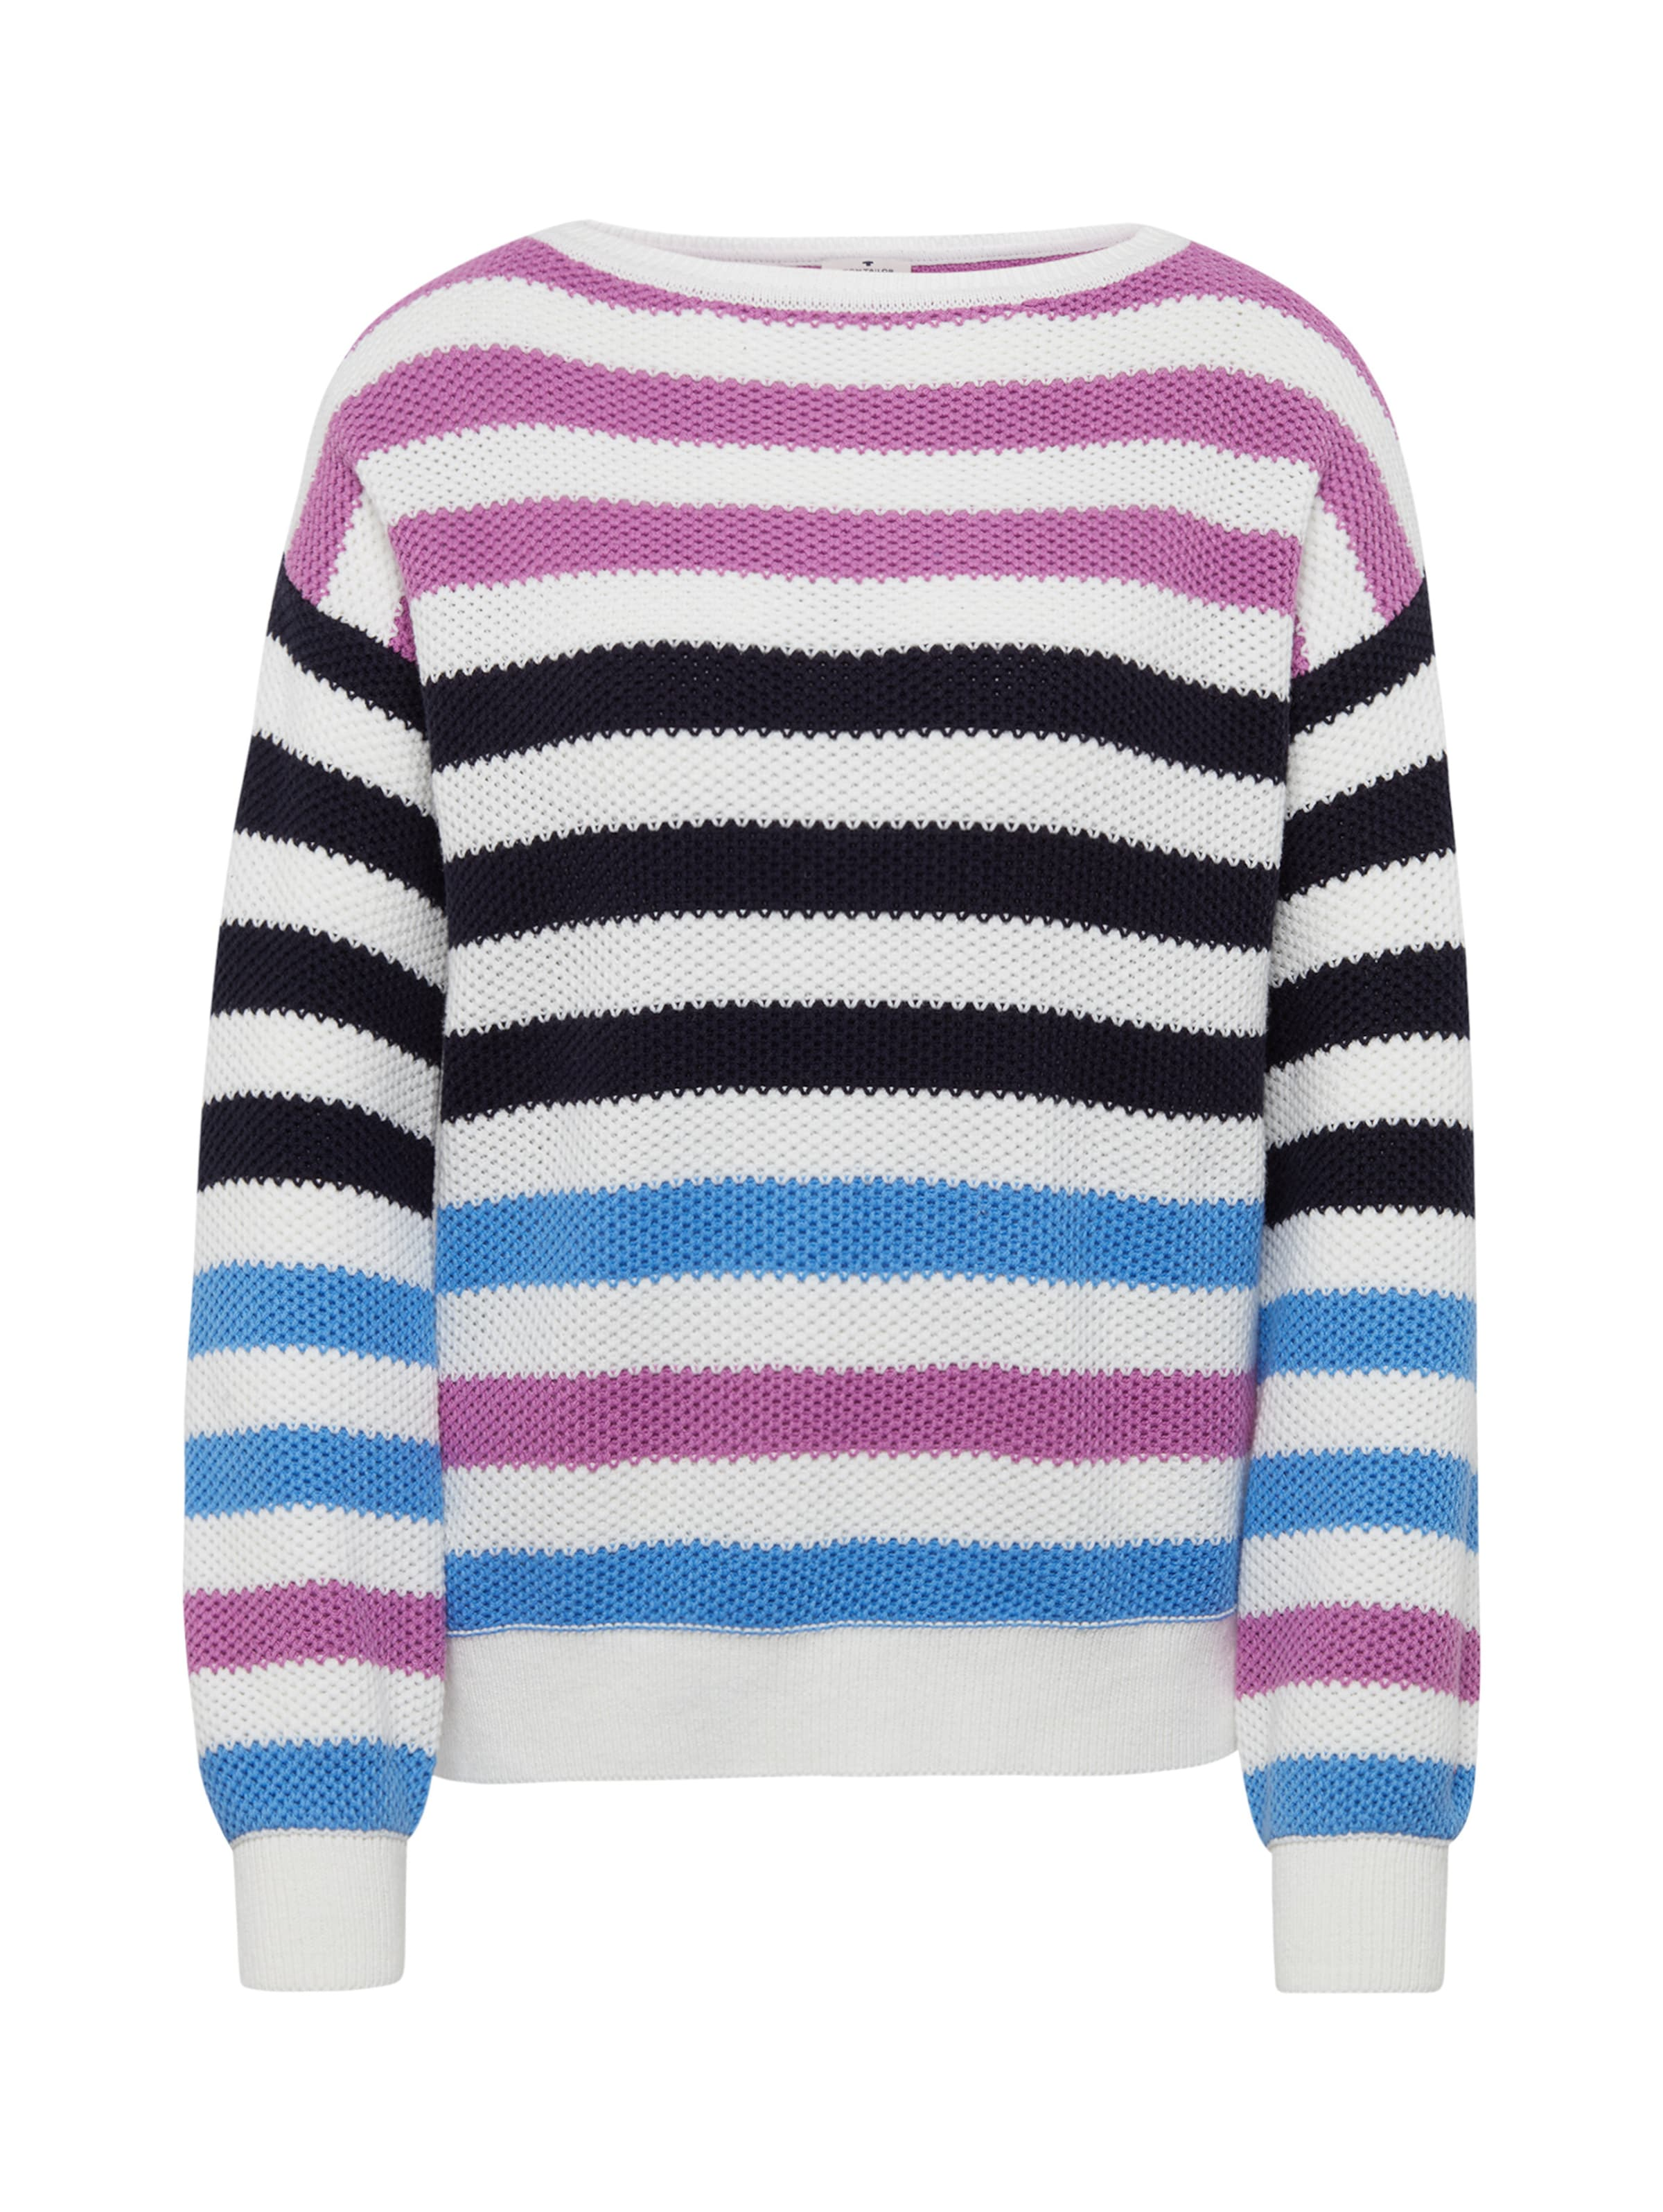 Pullover Lila In NachtblauHimmelblau Tom Tailor Wei uTFc1J3lK